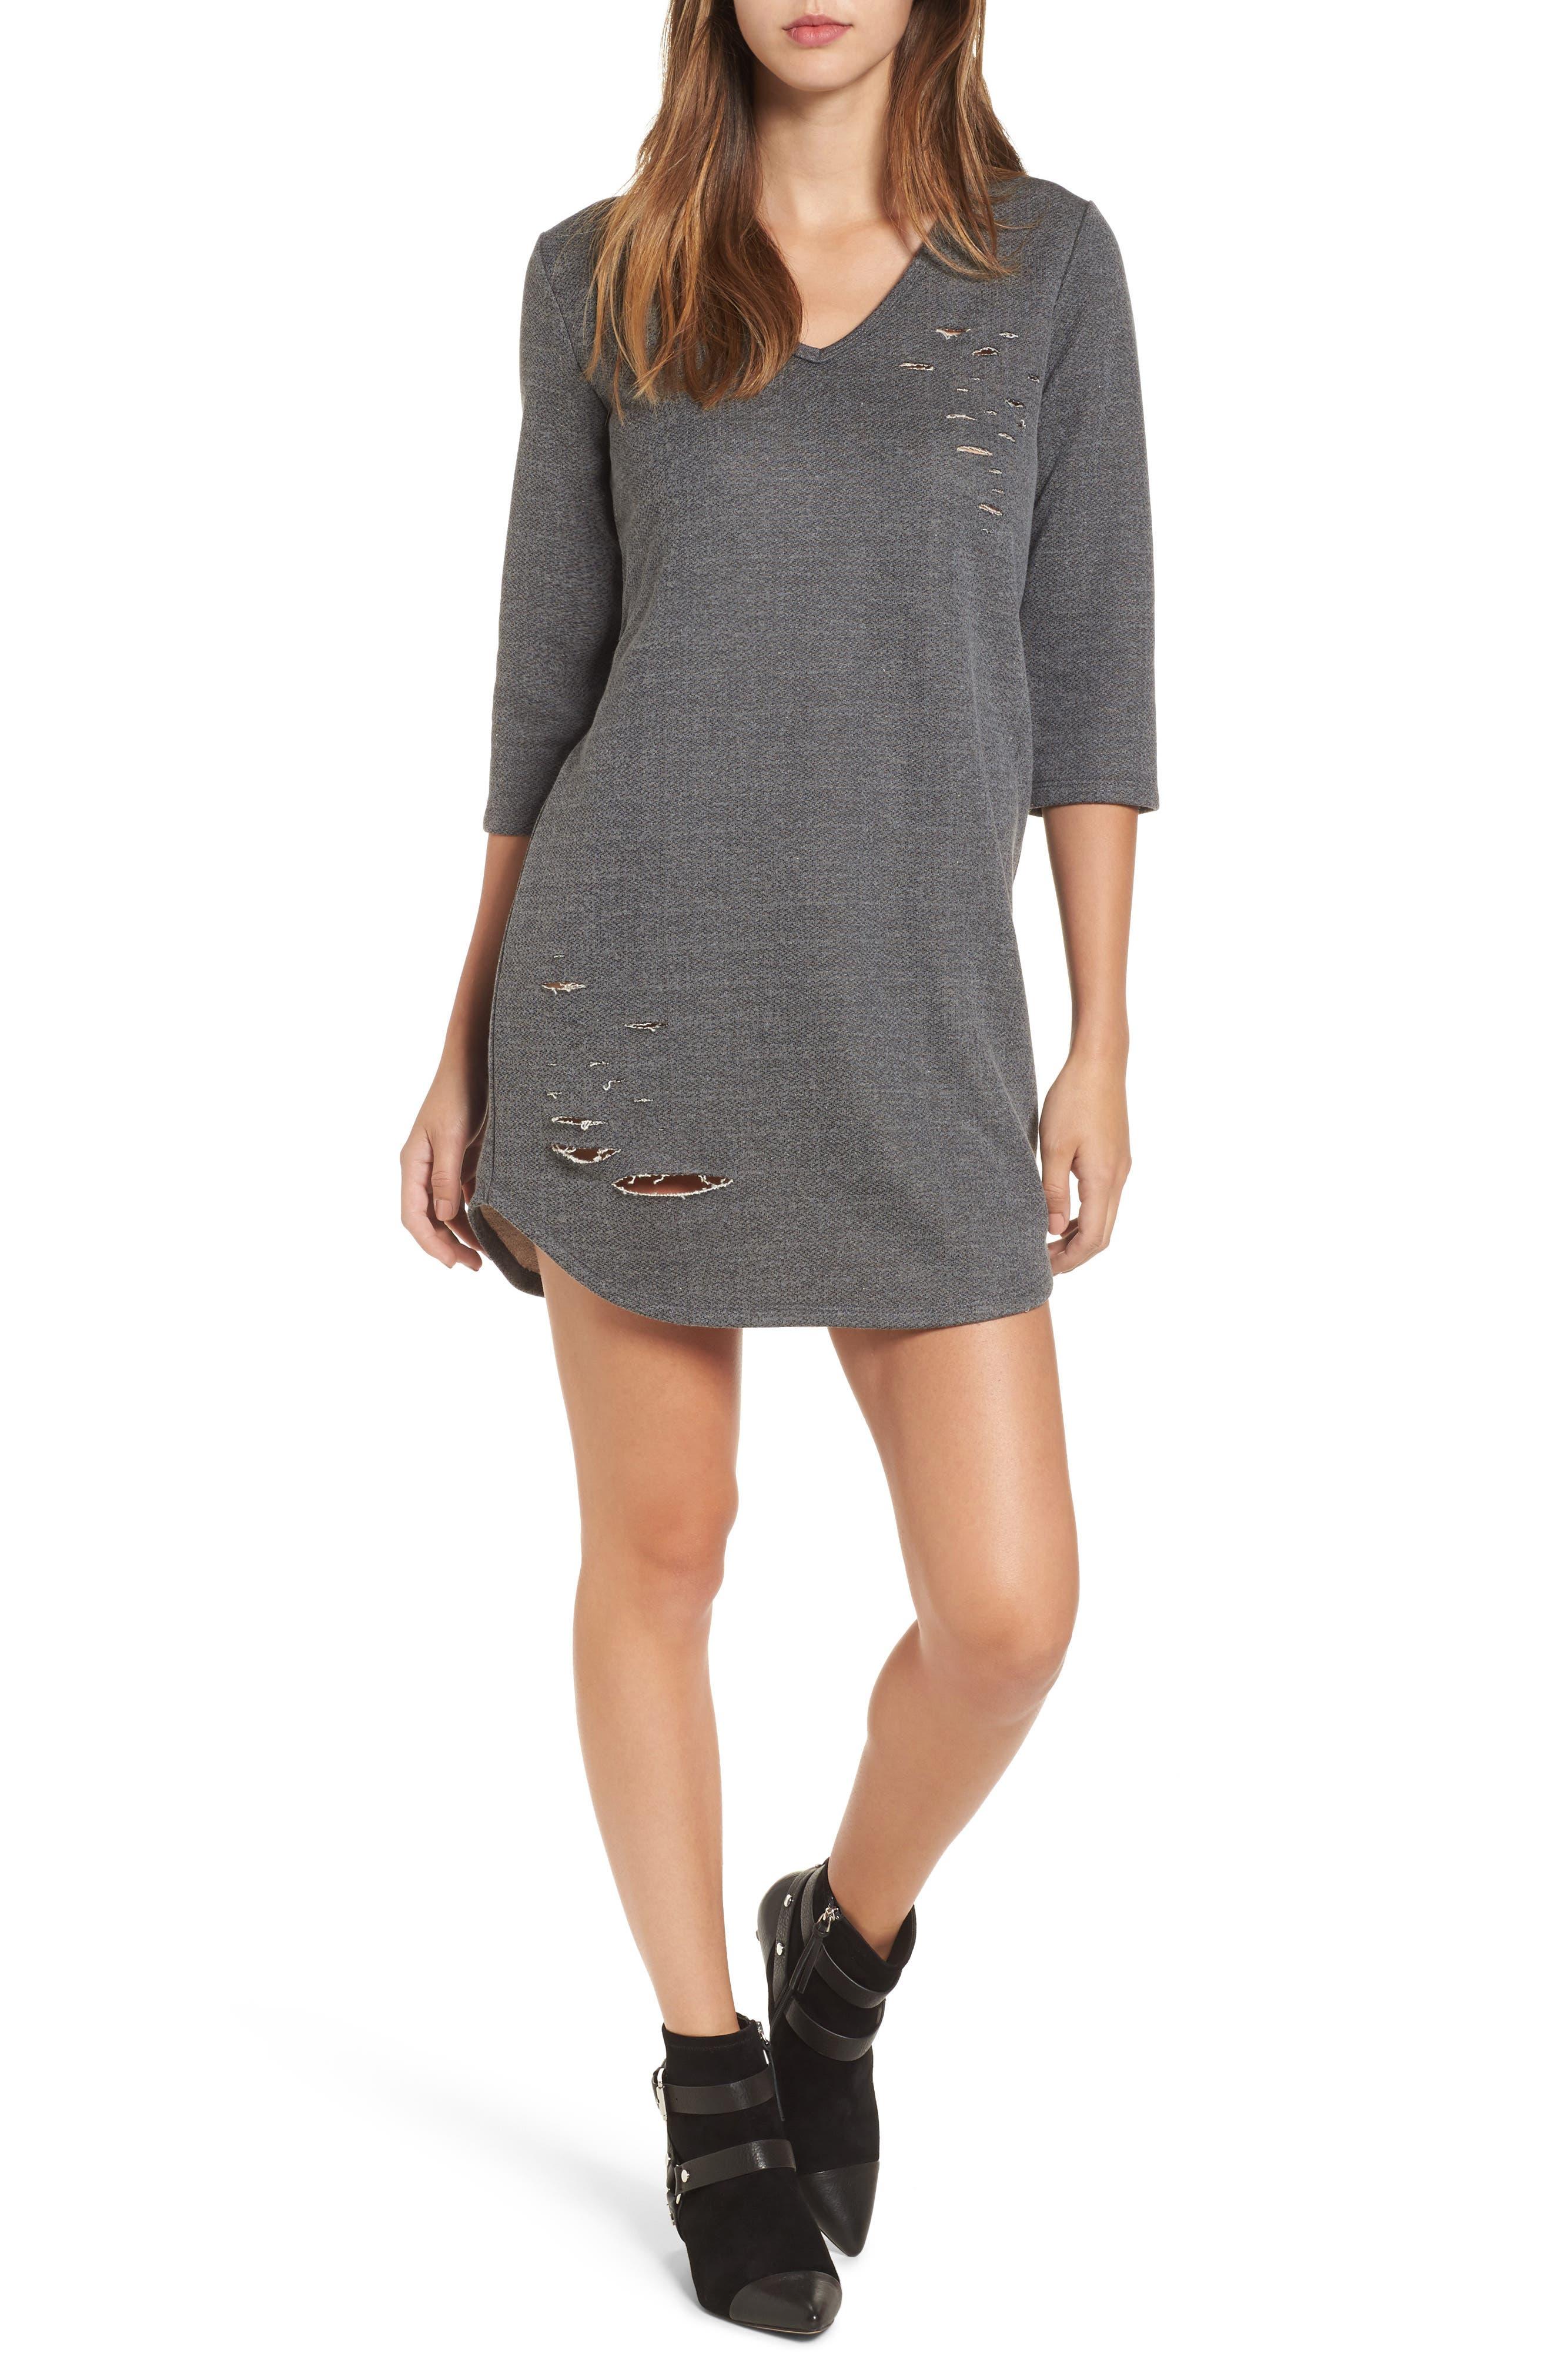 Everly Distressed Sweatshirt Dress